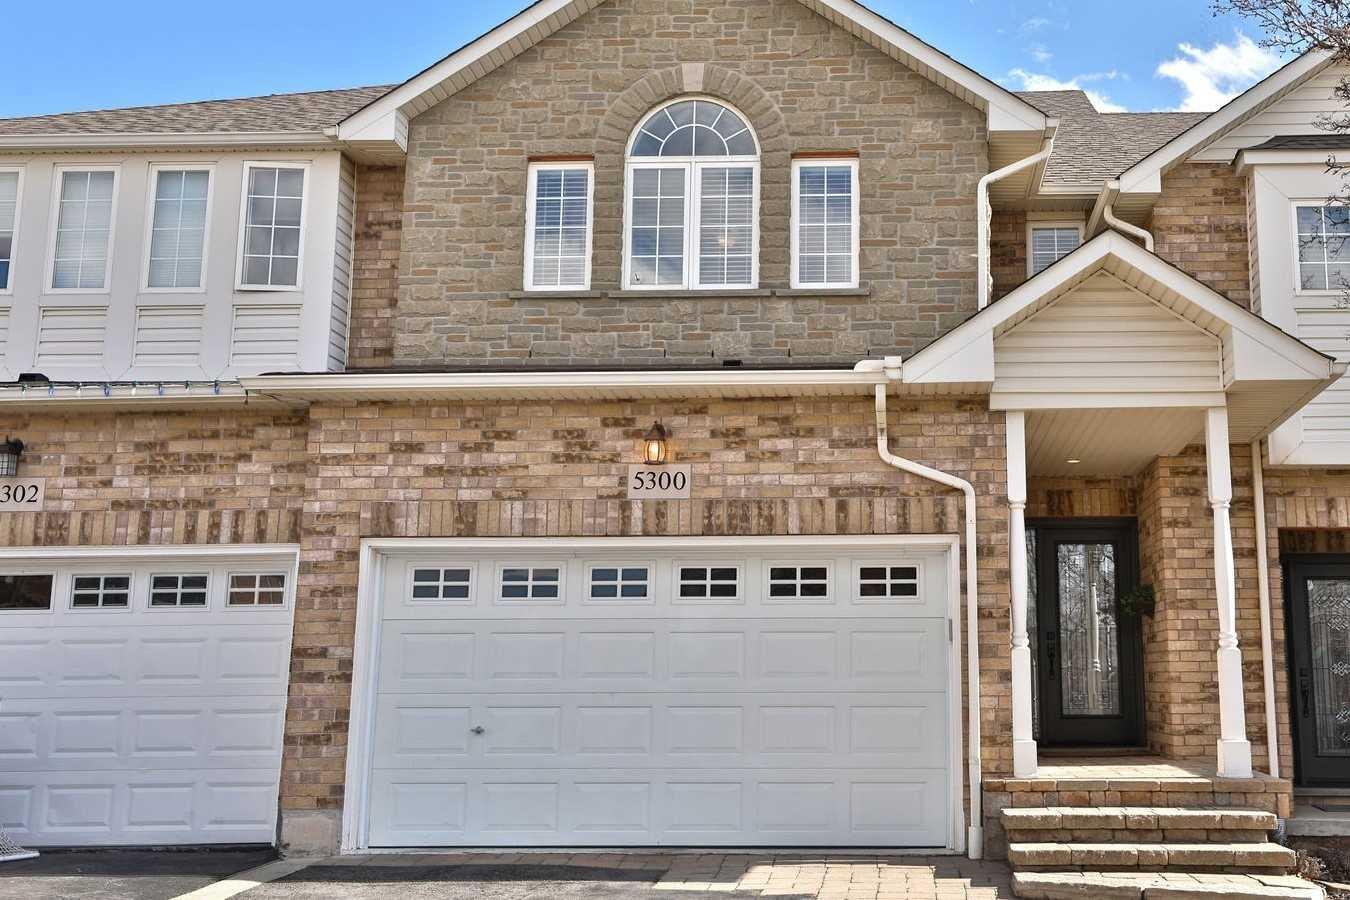 5300 Dryden Ave, Burlington, Ontario L7L6Z9, 3 Bedrooms Bedrooms, ,3 BathroomsBathrooms,Att/row/twnhouse,For Sale,Dryden,W5157512